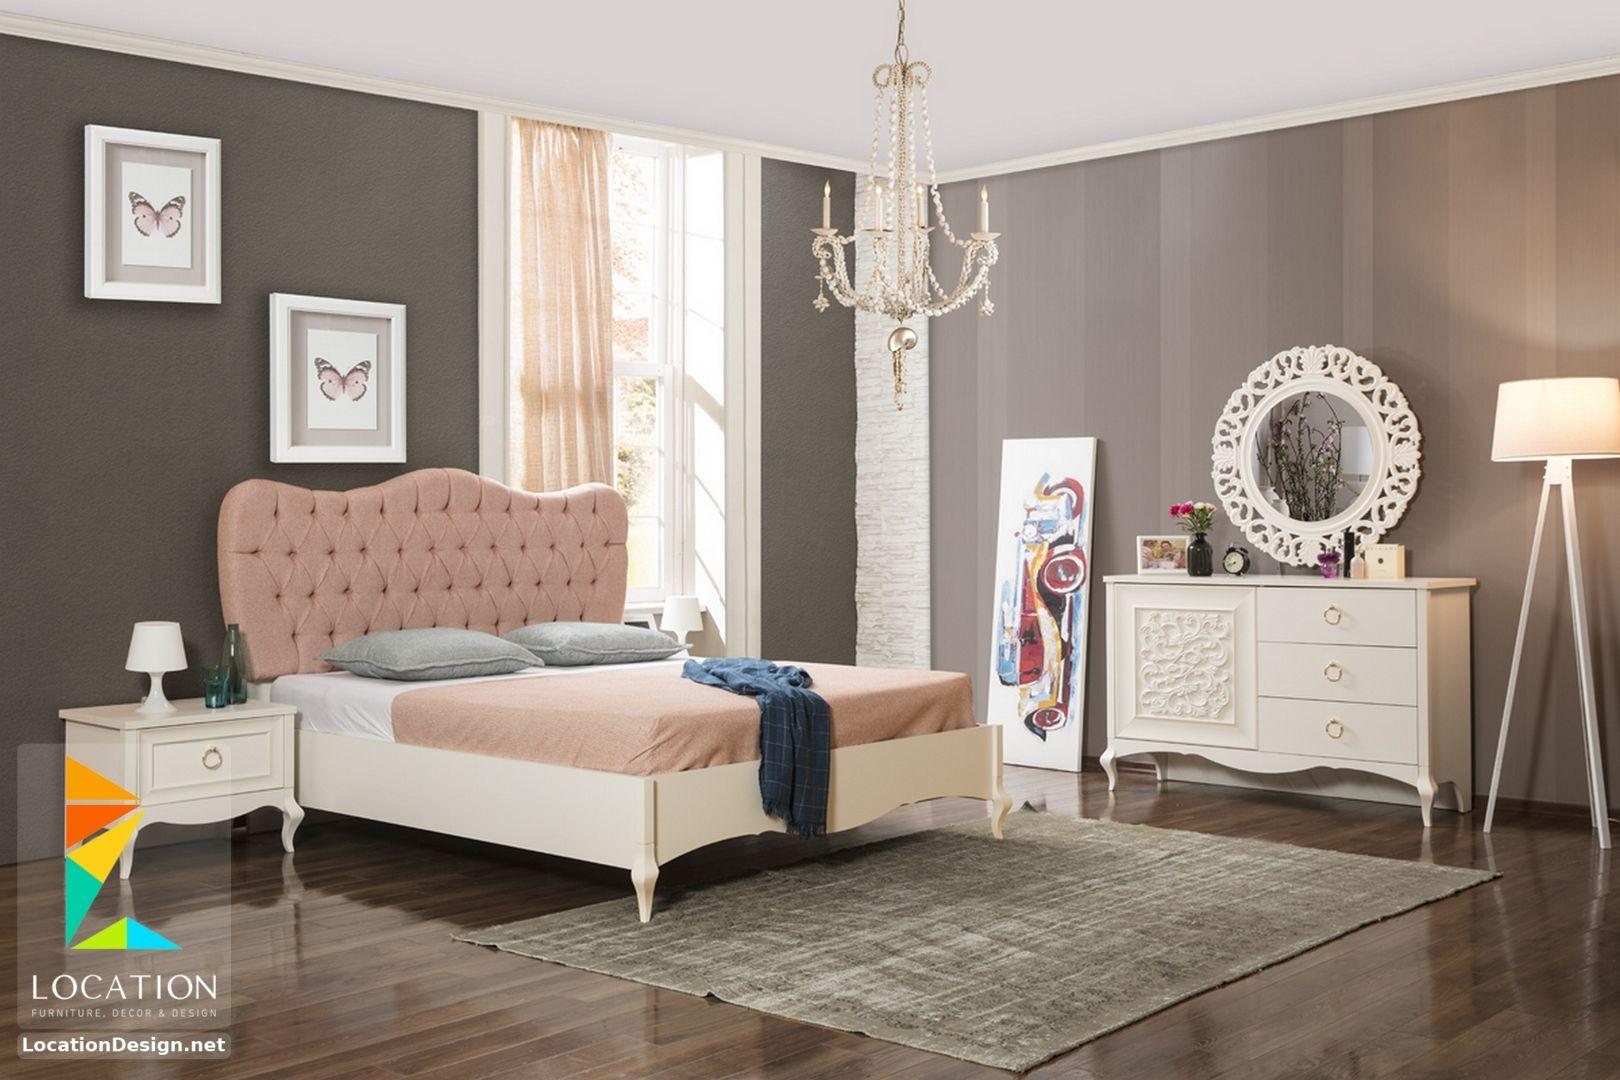 احدث موديلات و اشكال غرف نوم تركي 2019 2020 Home Furniture Interior Design